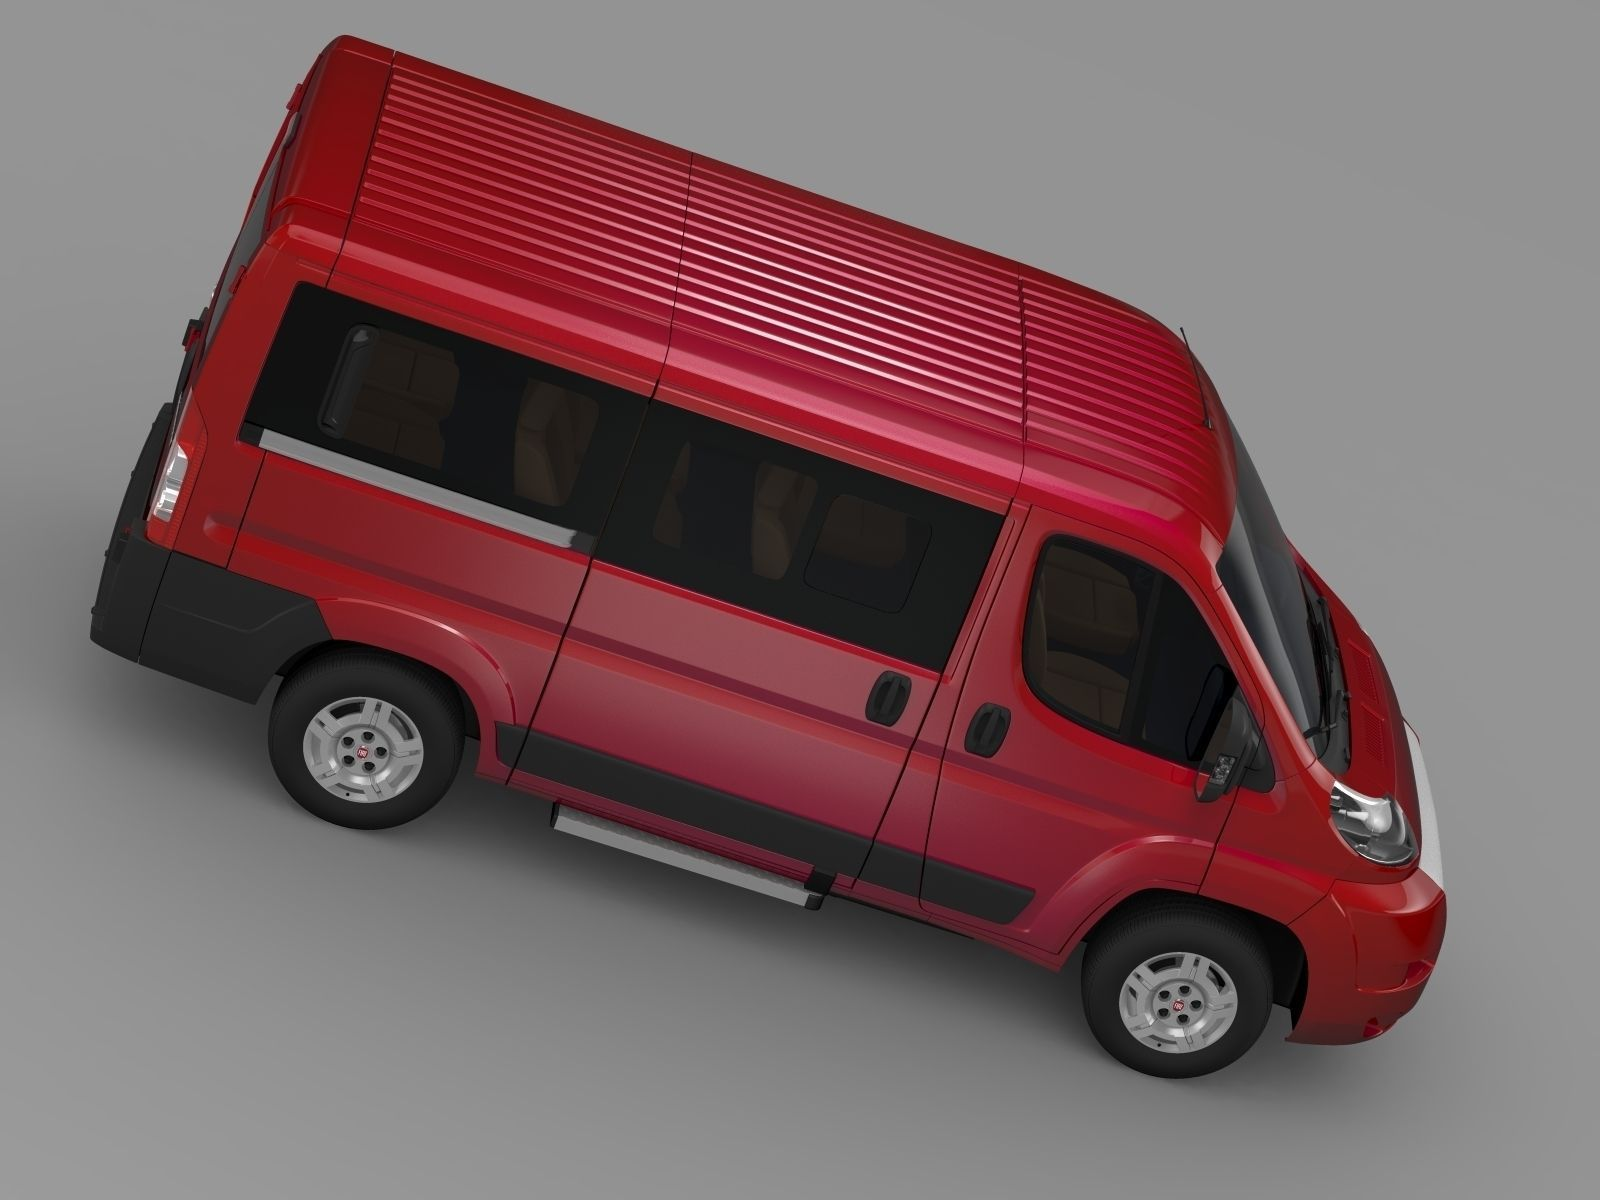 fiat ducato mini bus l1h1 2006 2014 3d model max obj 3ds. Black Bedroom Furniture Sets. Home Design Ideas